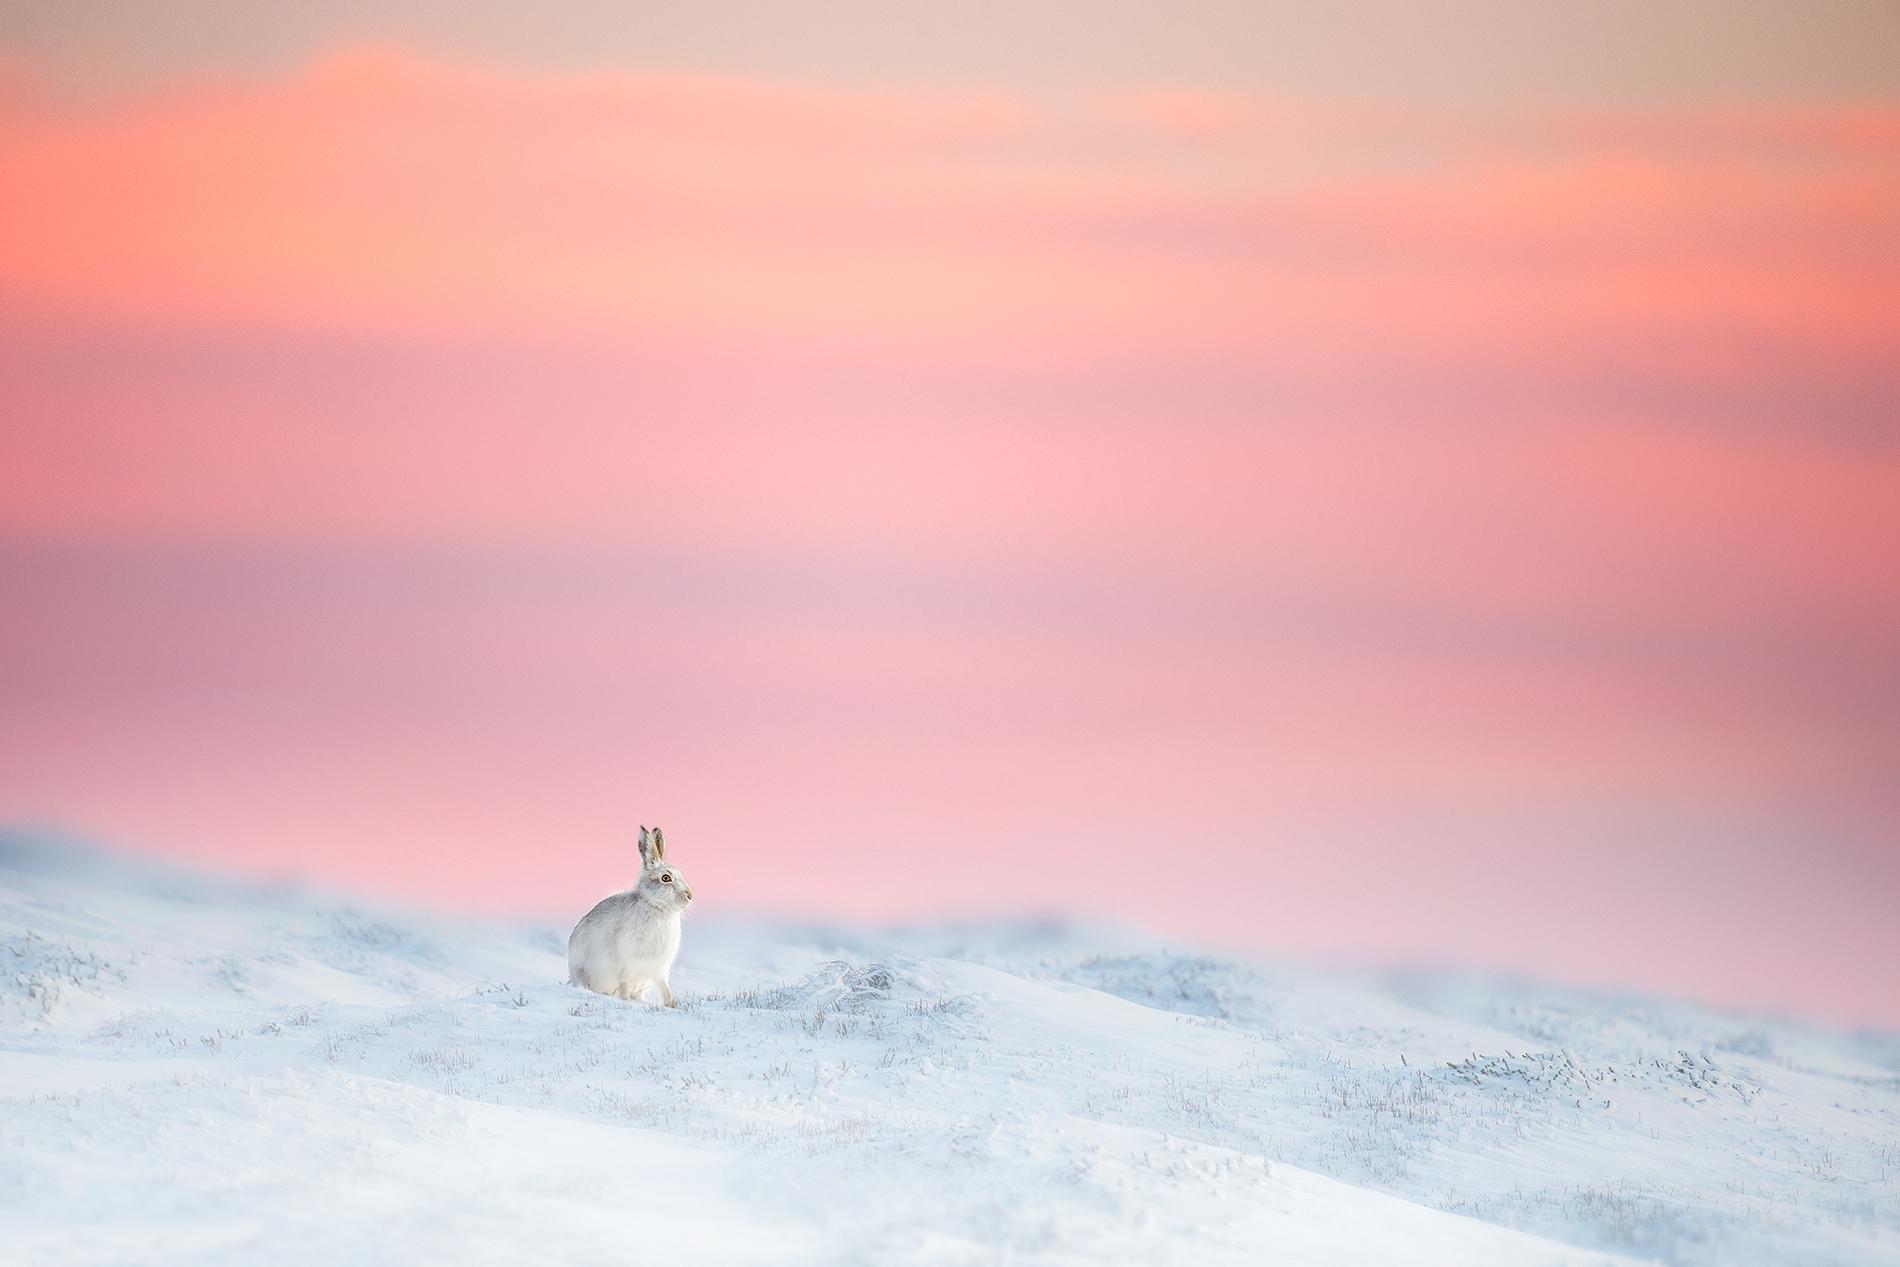 Mountain Hare at Dusk